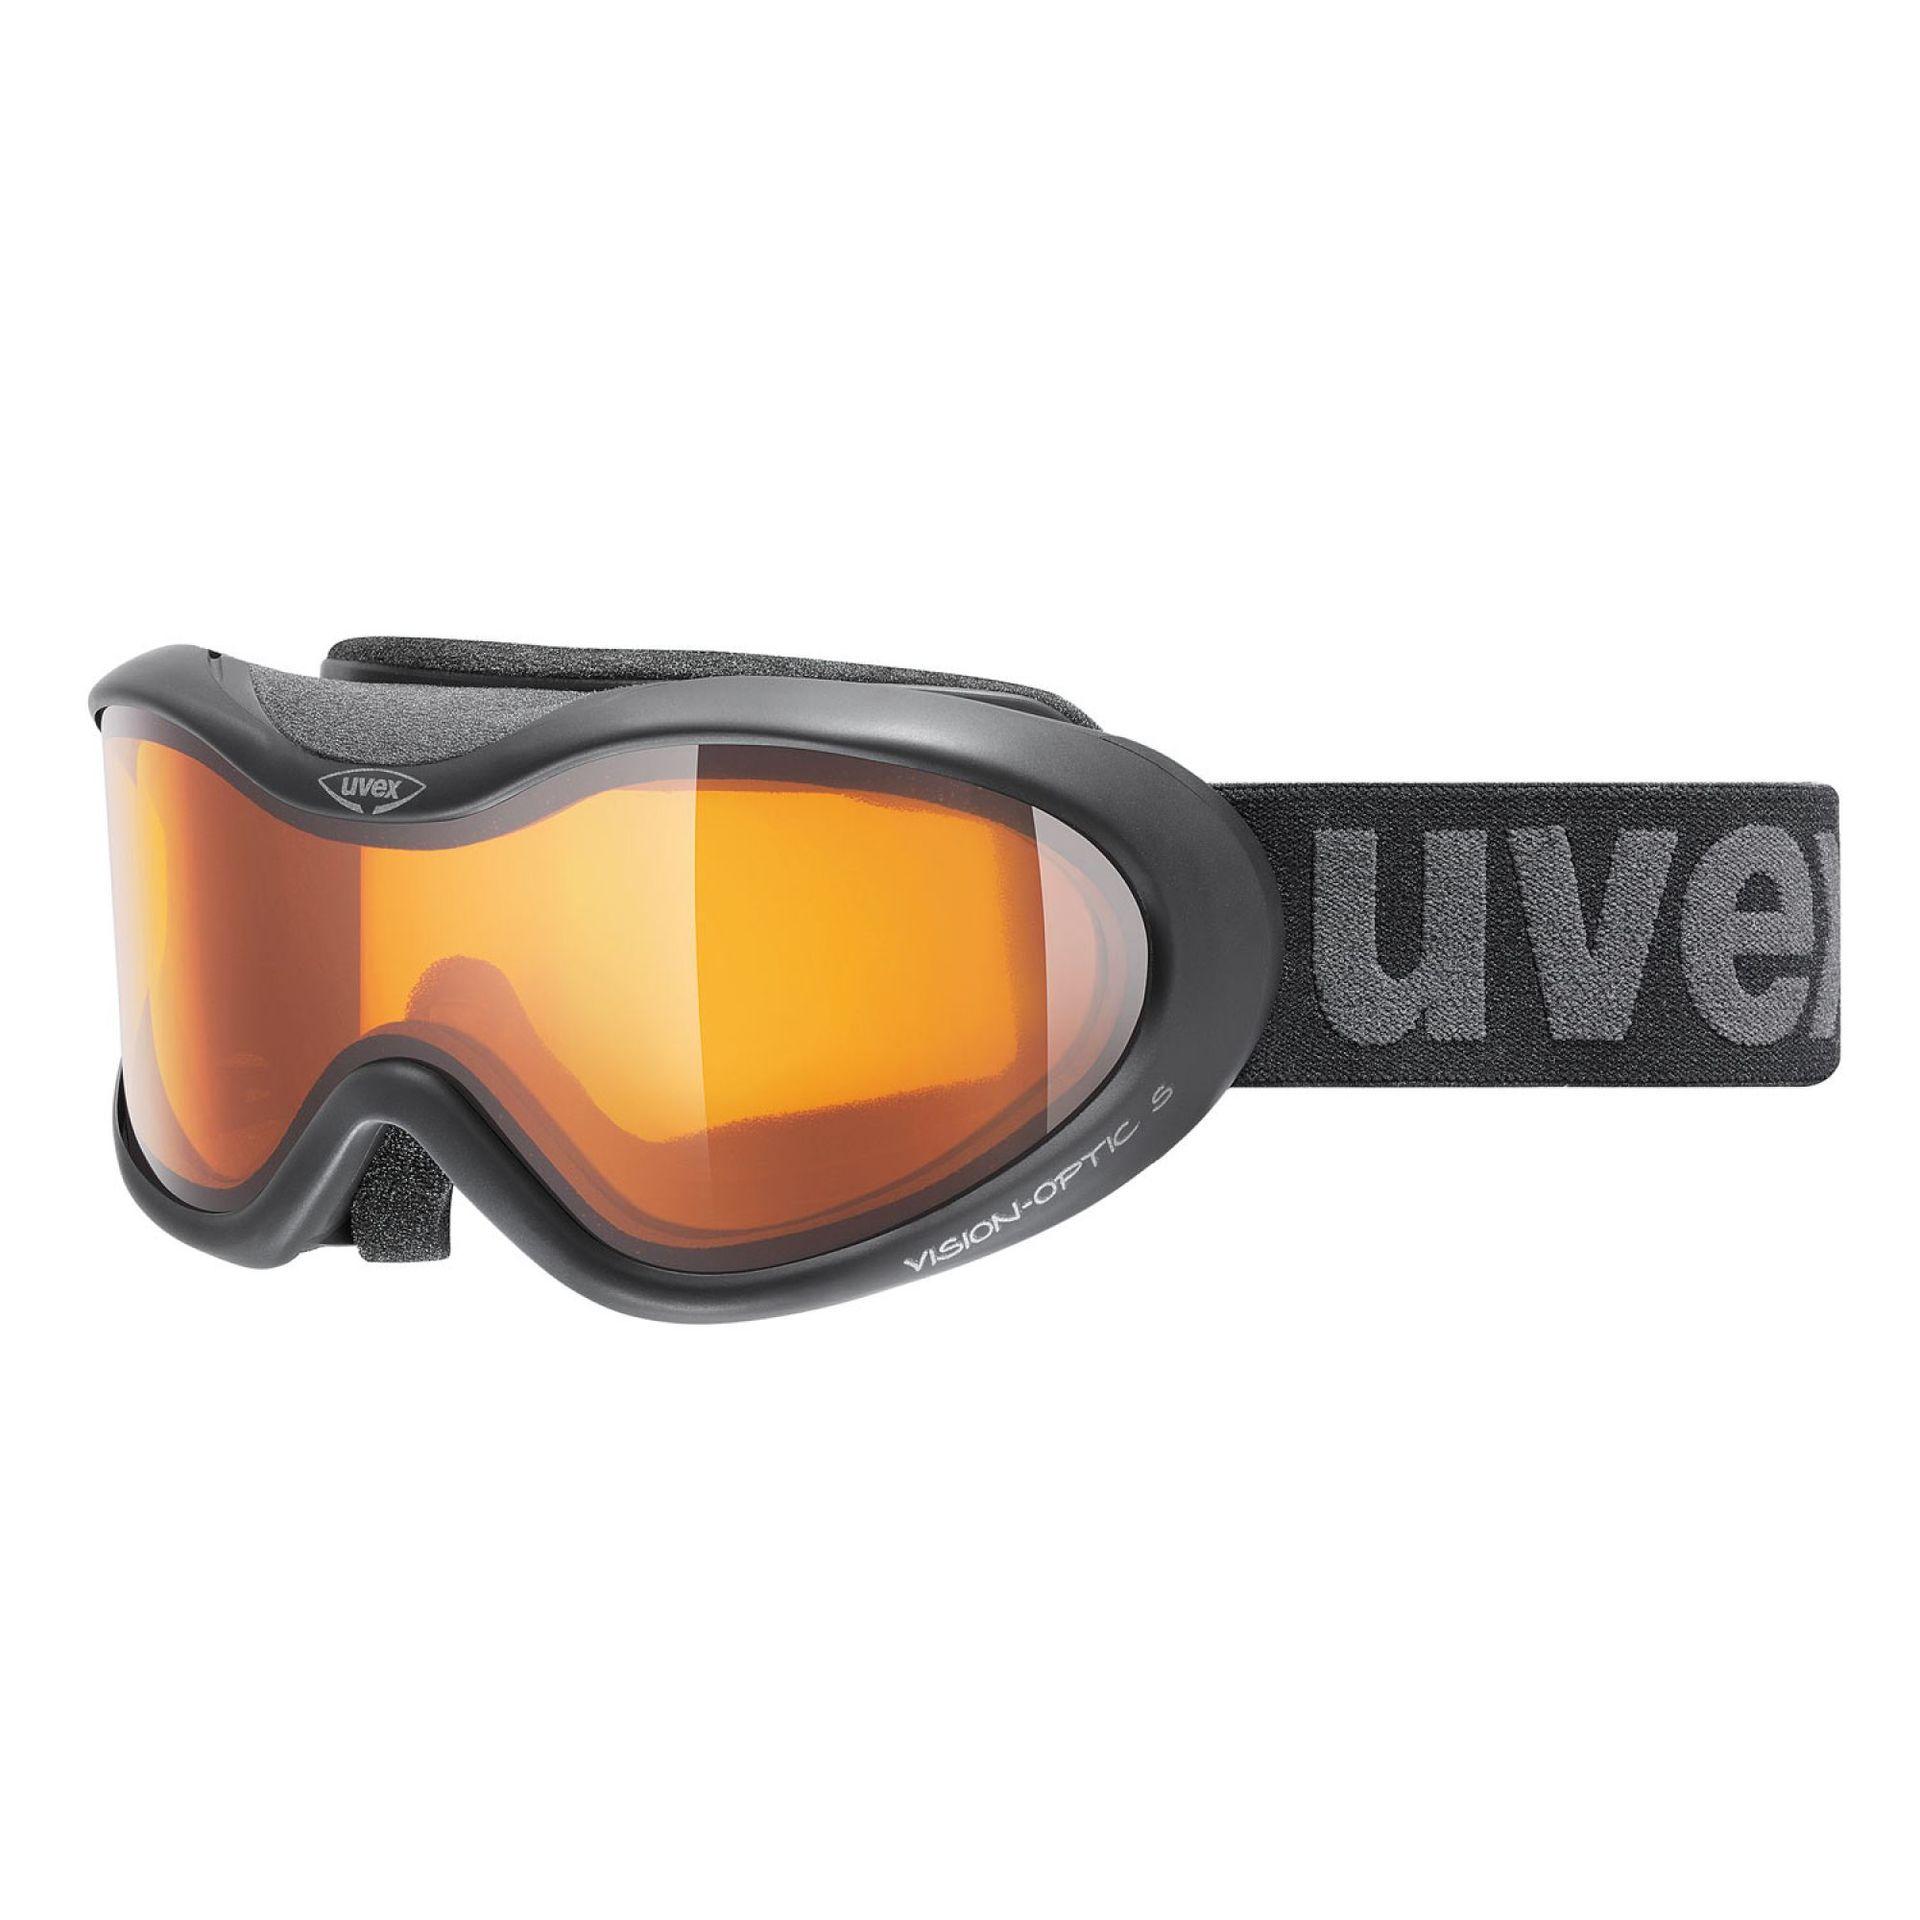 GOGLE UVEX VISION OPTIC S BLACK